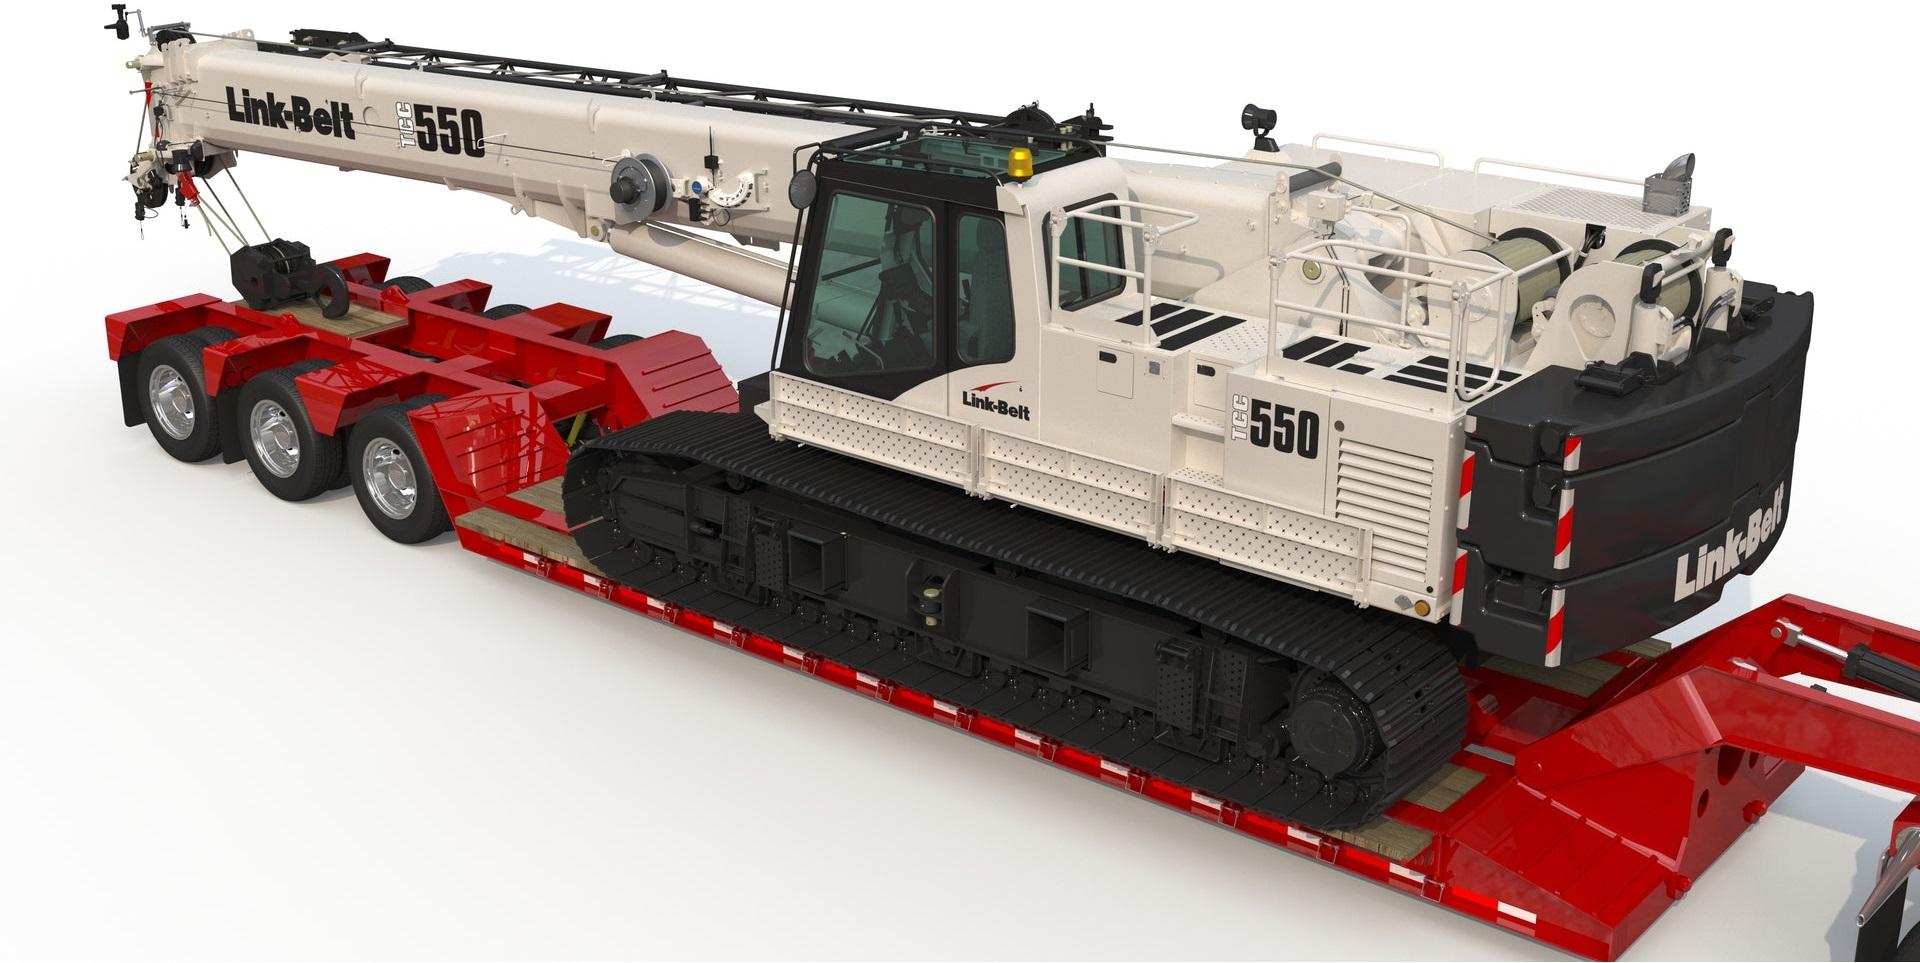 TCC_550_transport_001.60c38afdd251f-1